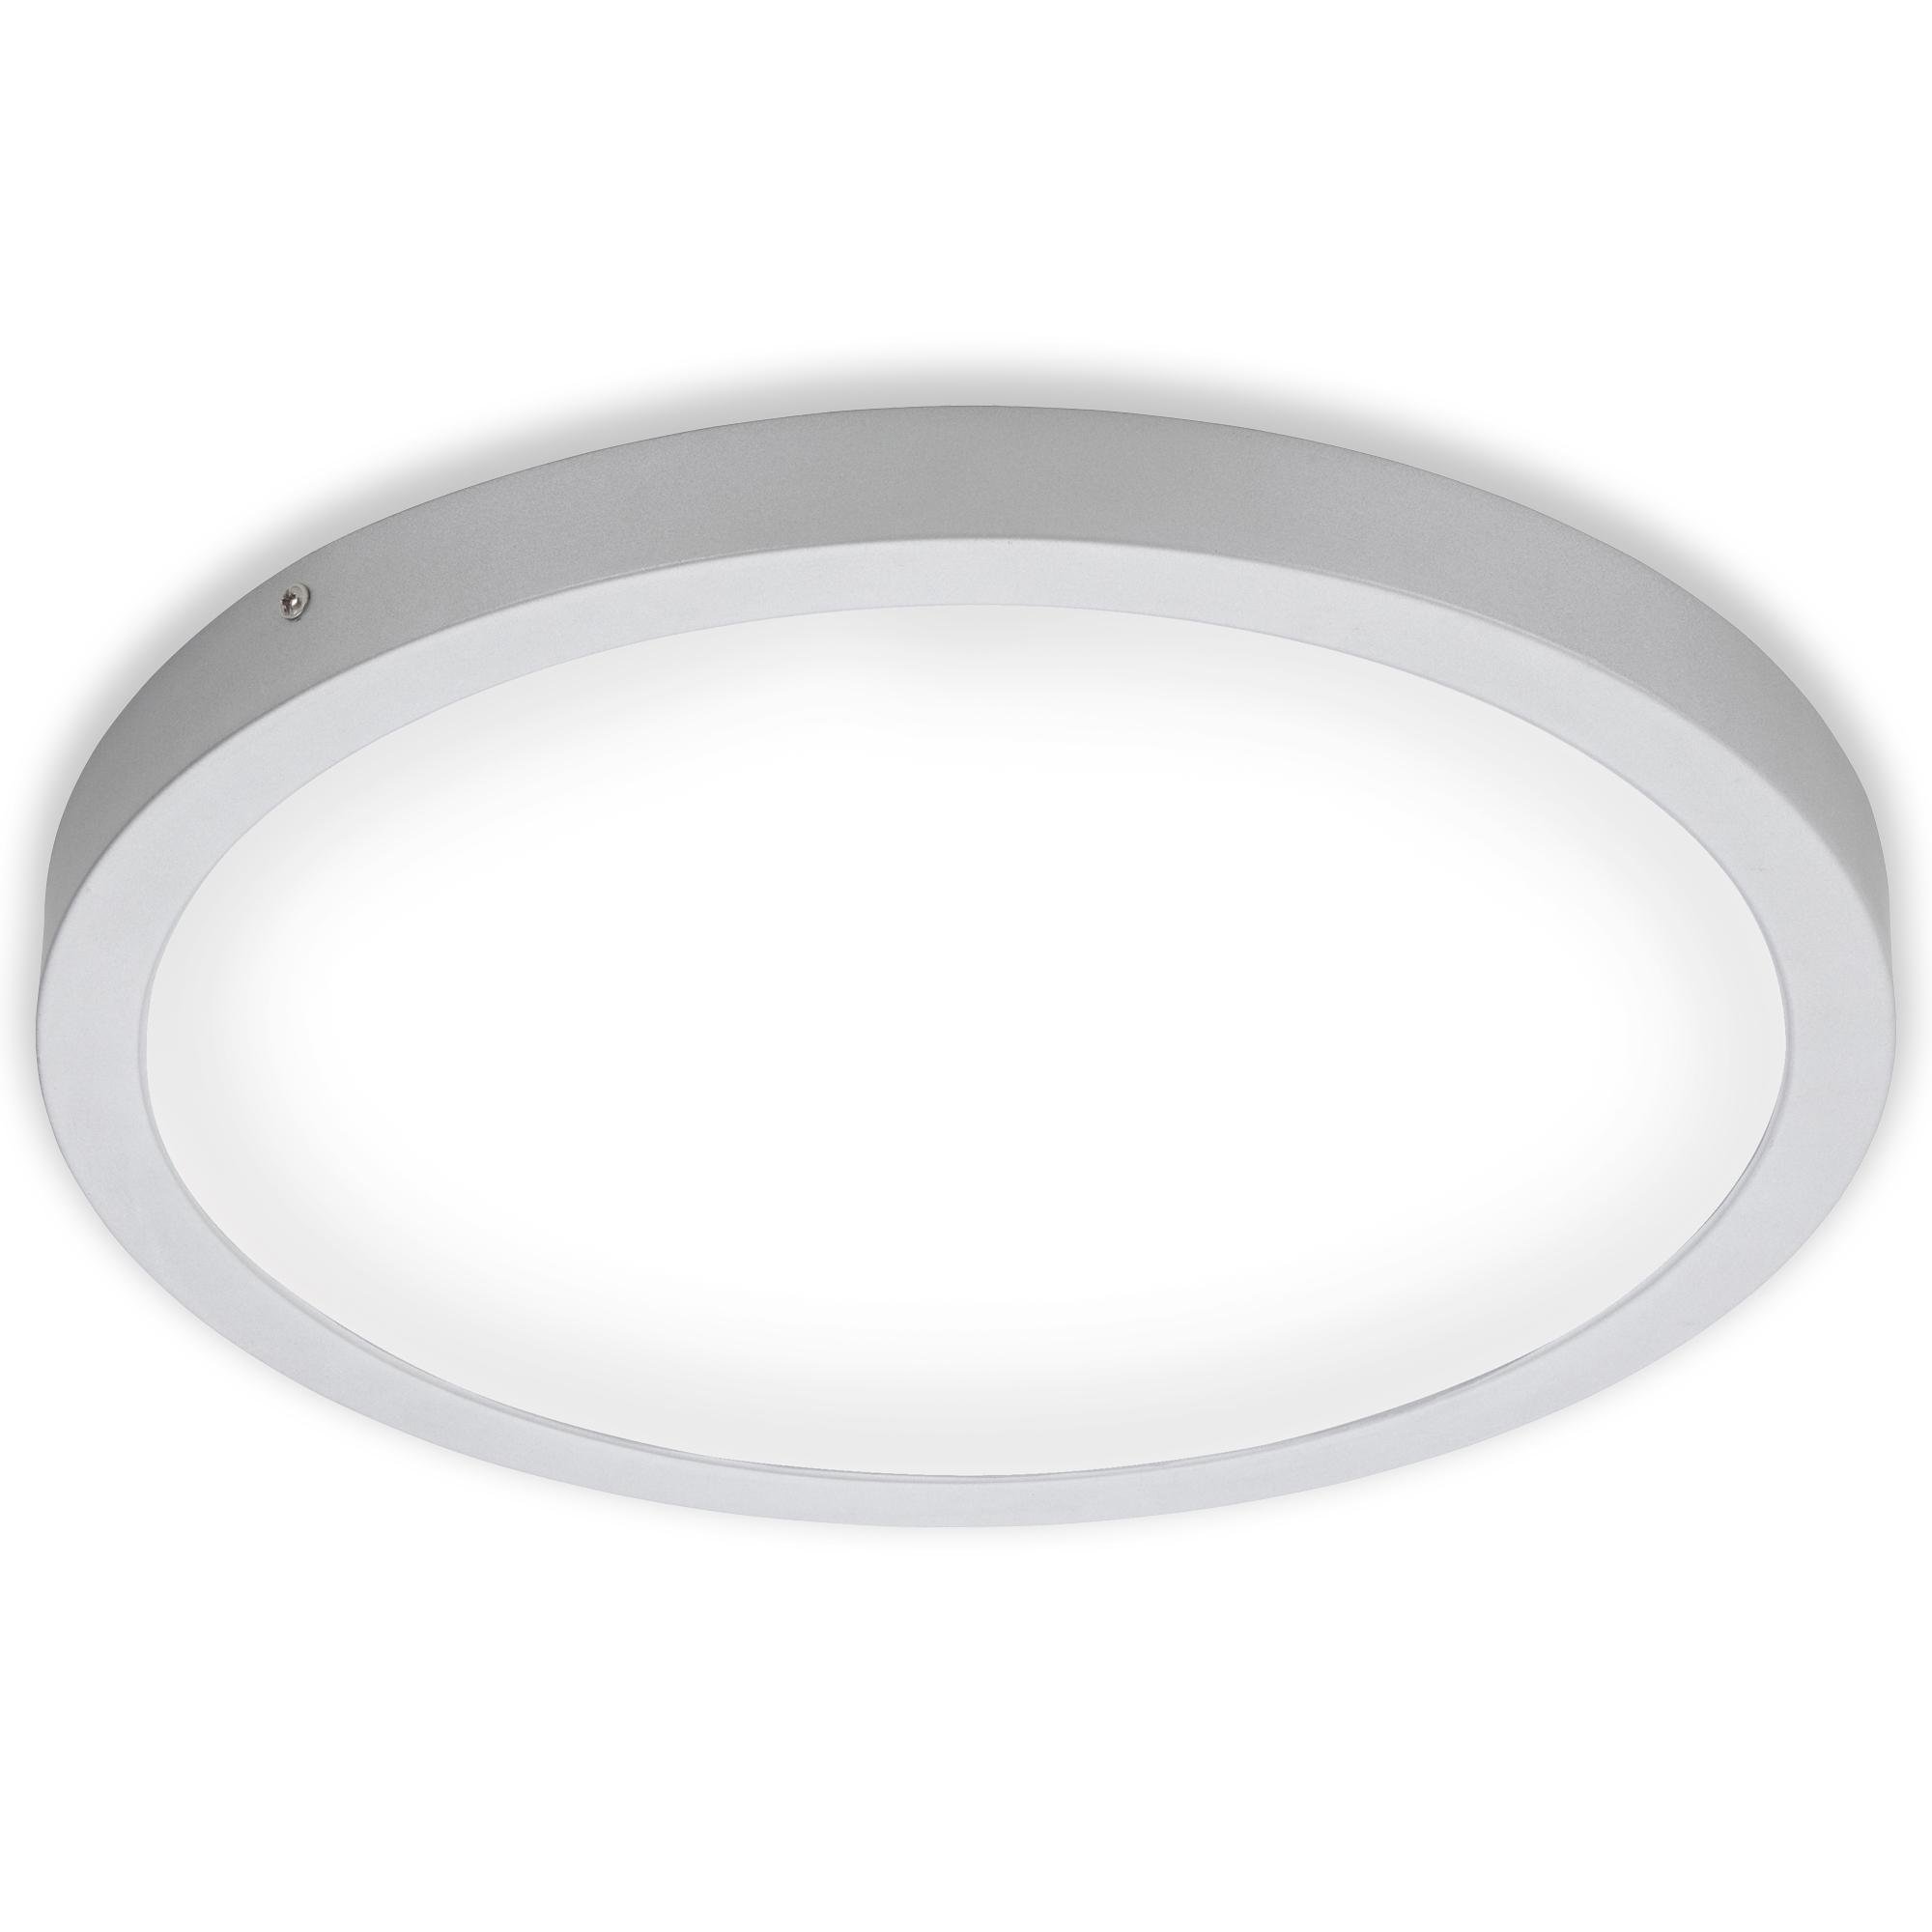 LED Deckenleuchte, Ø 40,5 , 24,5 W, Chrom-Matt